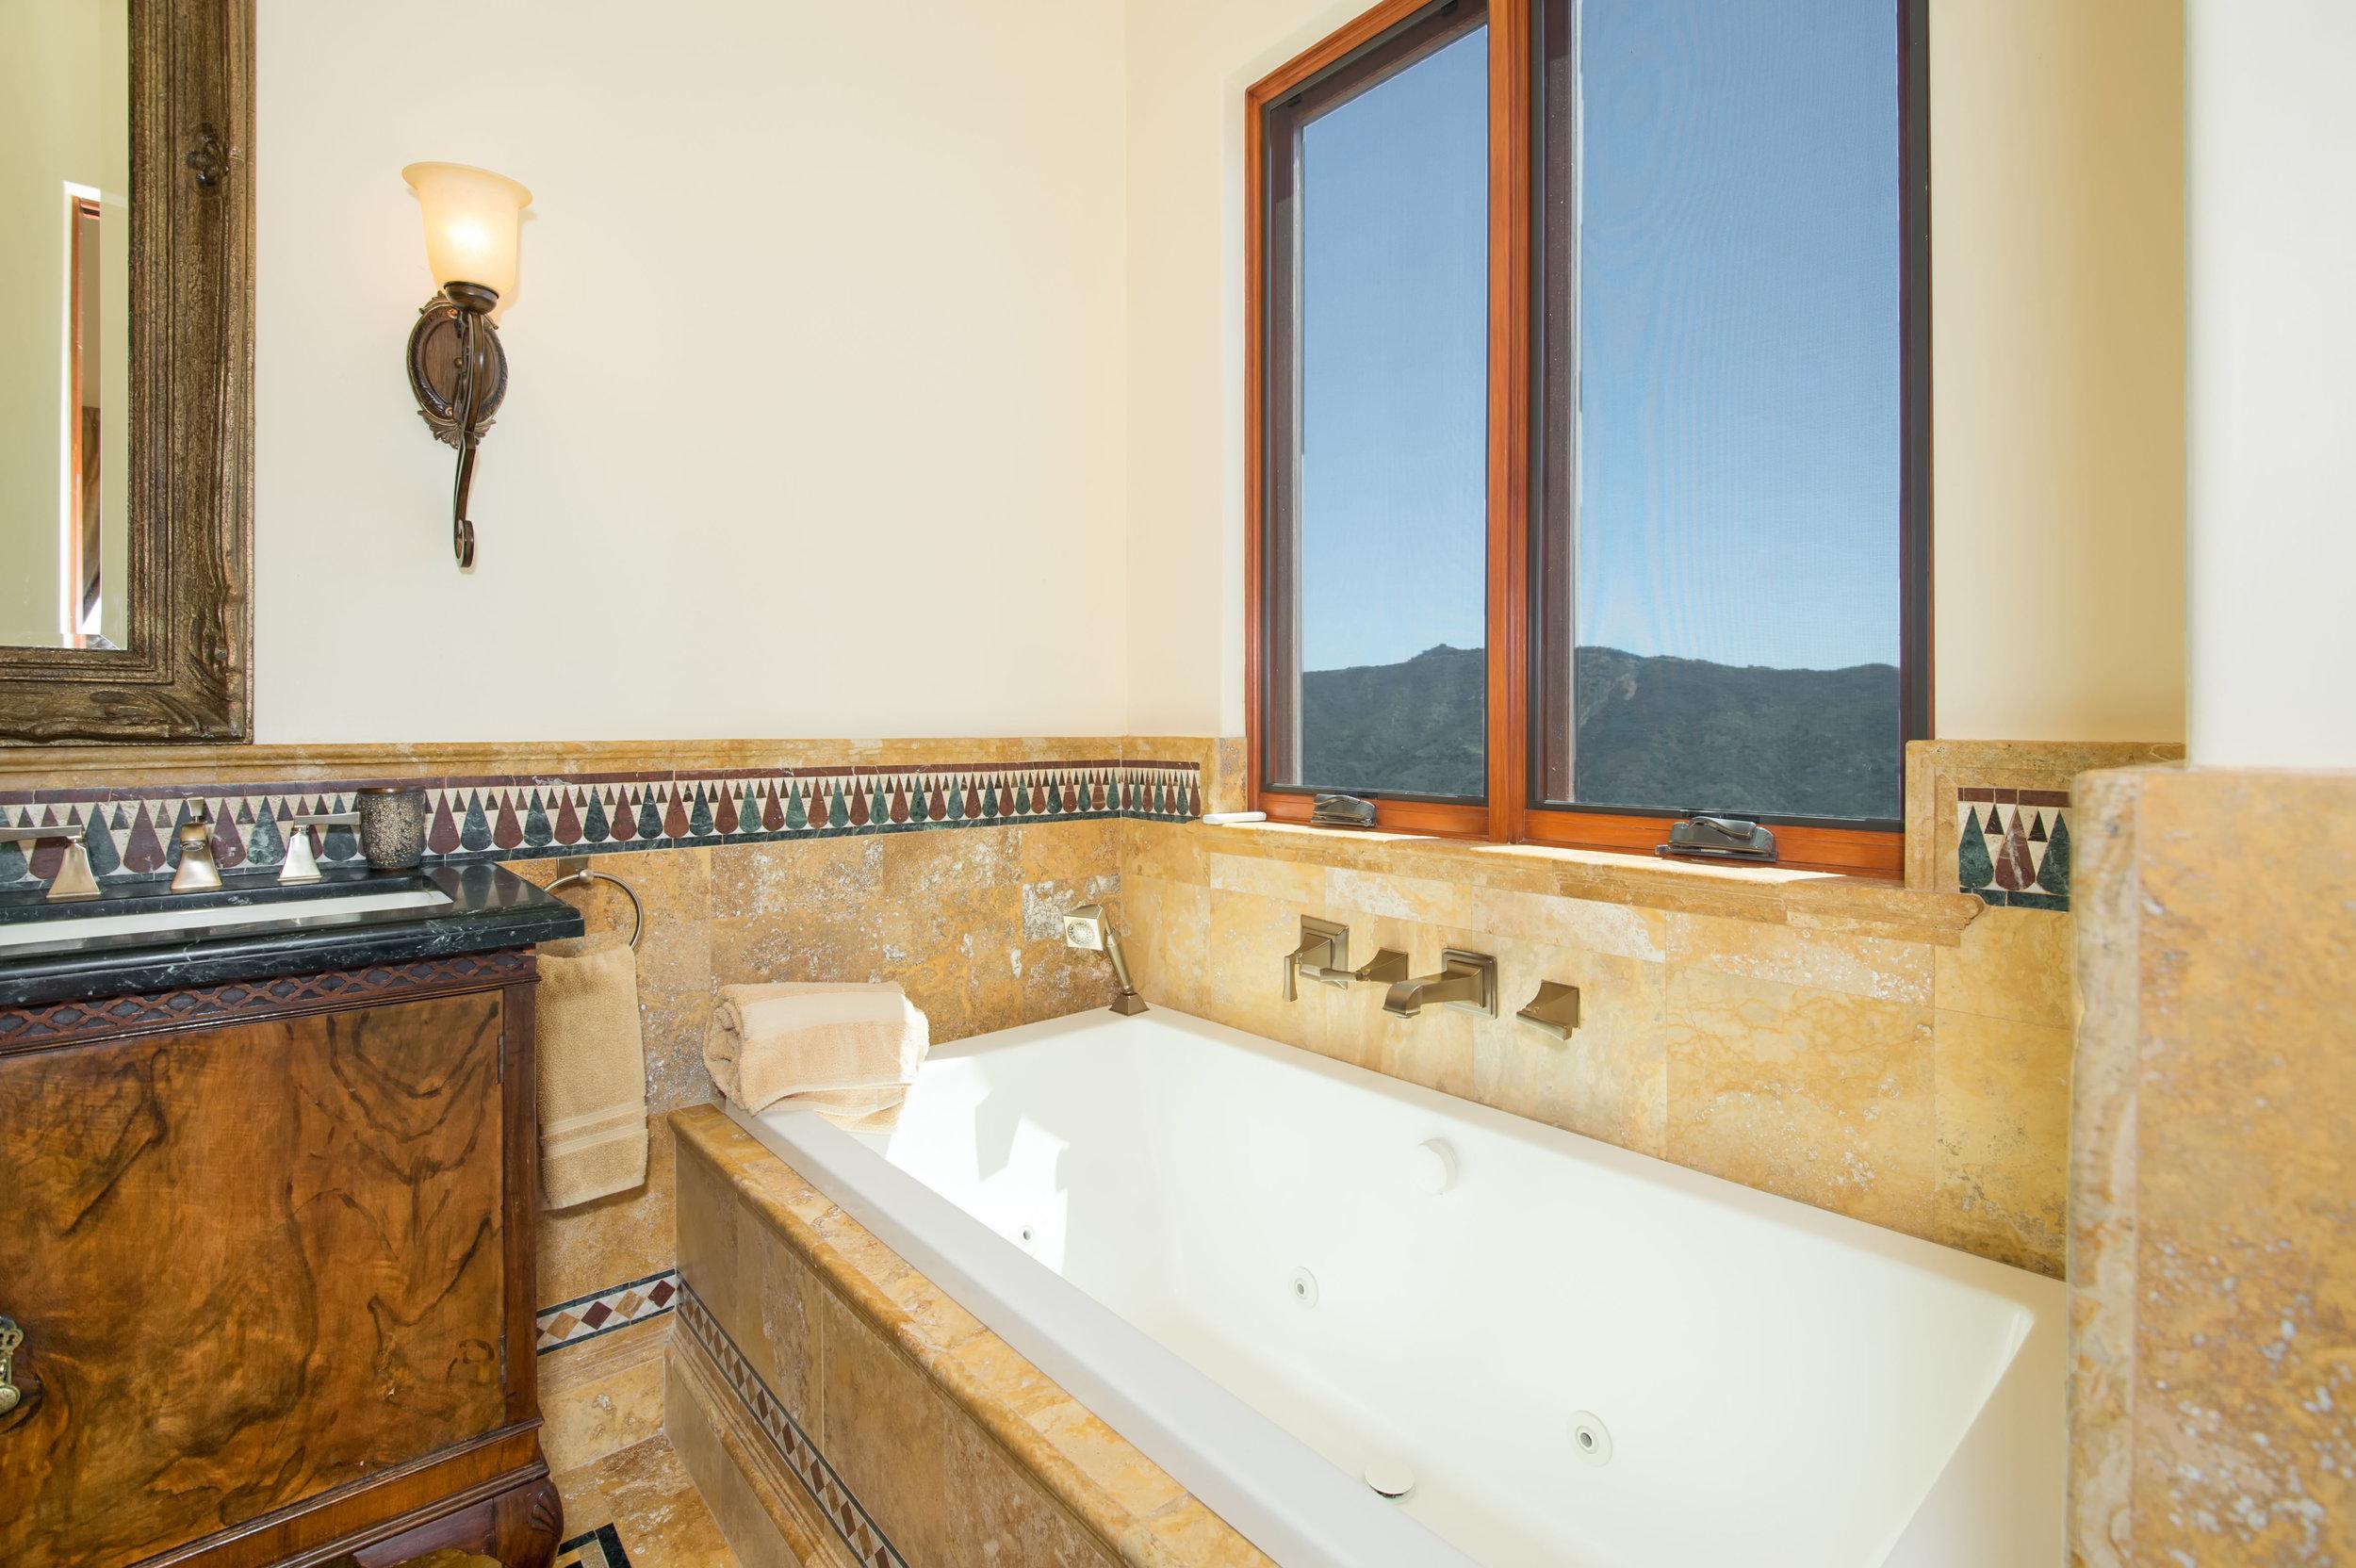 015 Master Bath 26303 Lockwood Road Malibu For Sale Lease The Malibu Life Team Luxury Real Estate.jpg